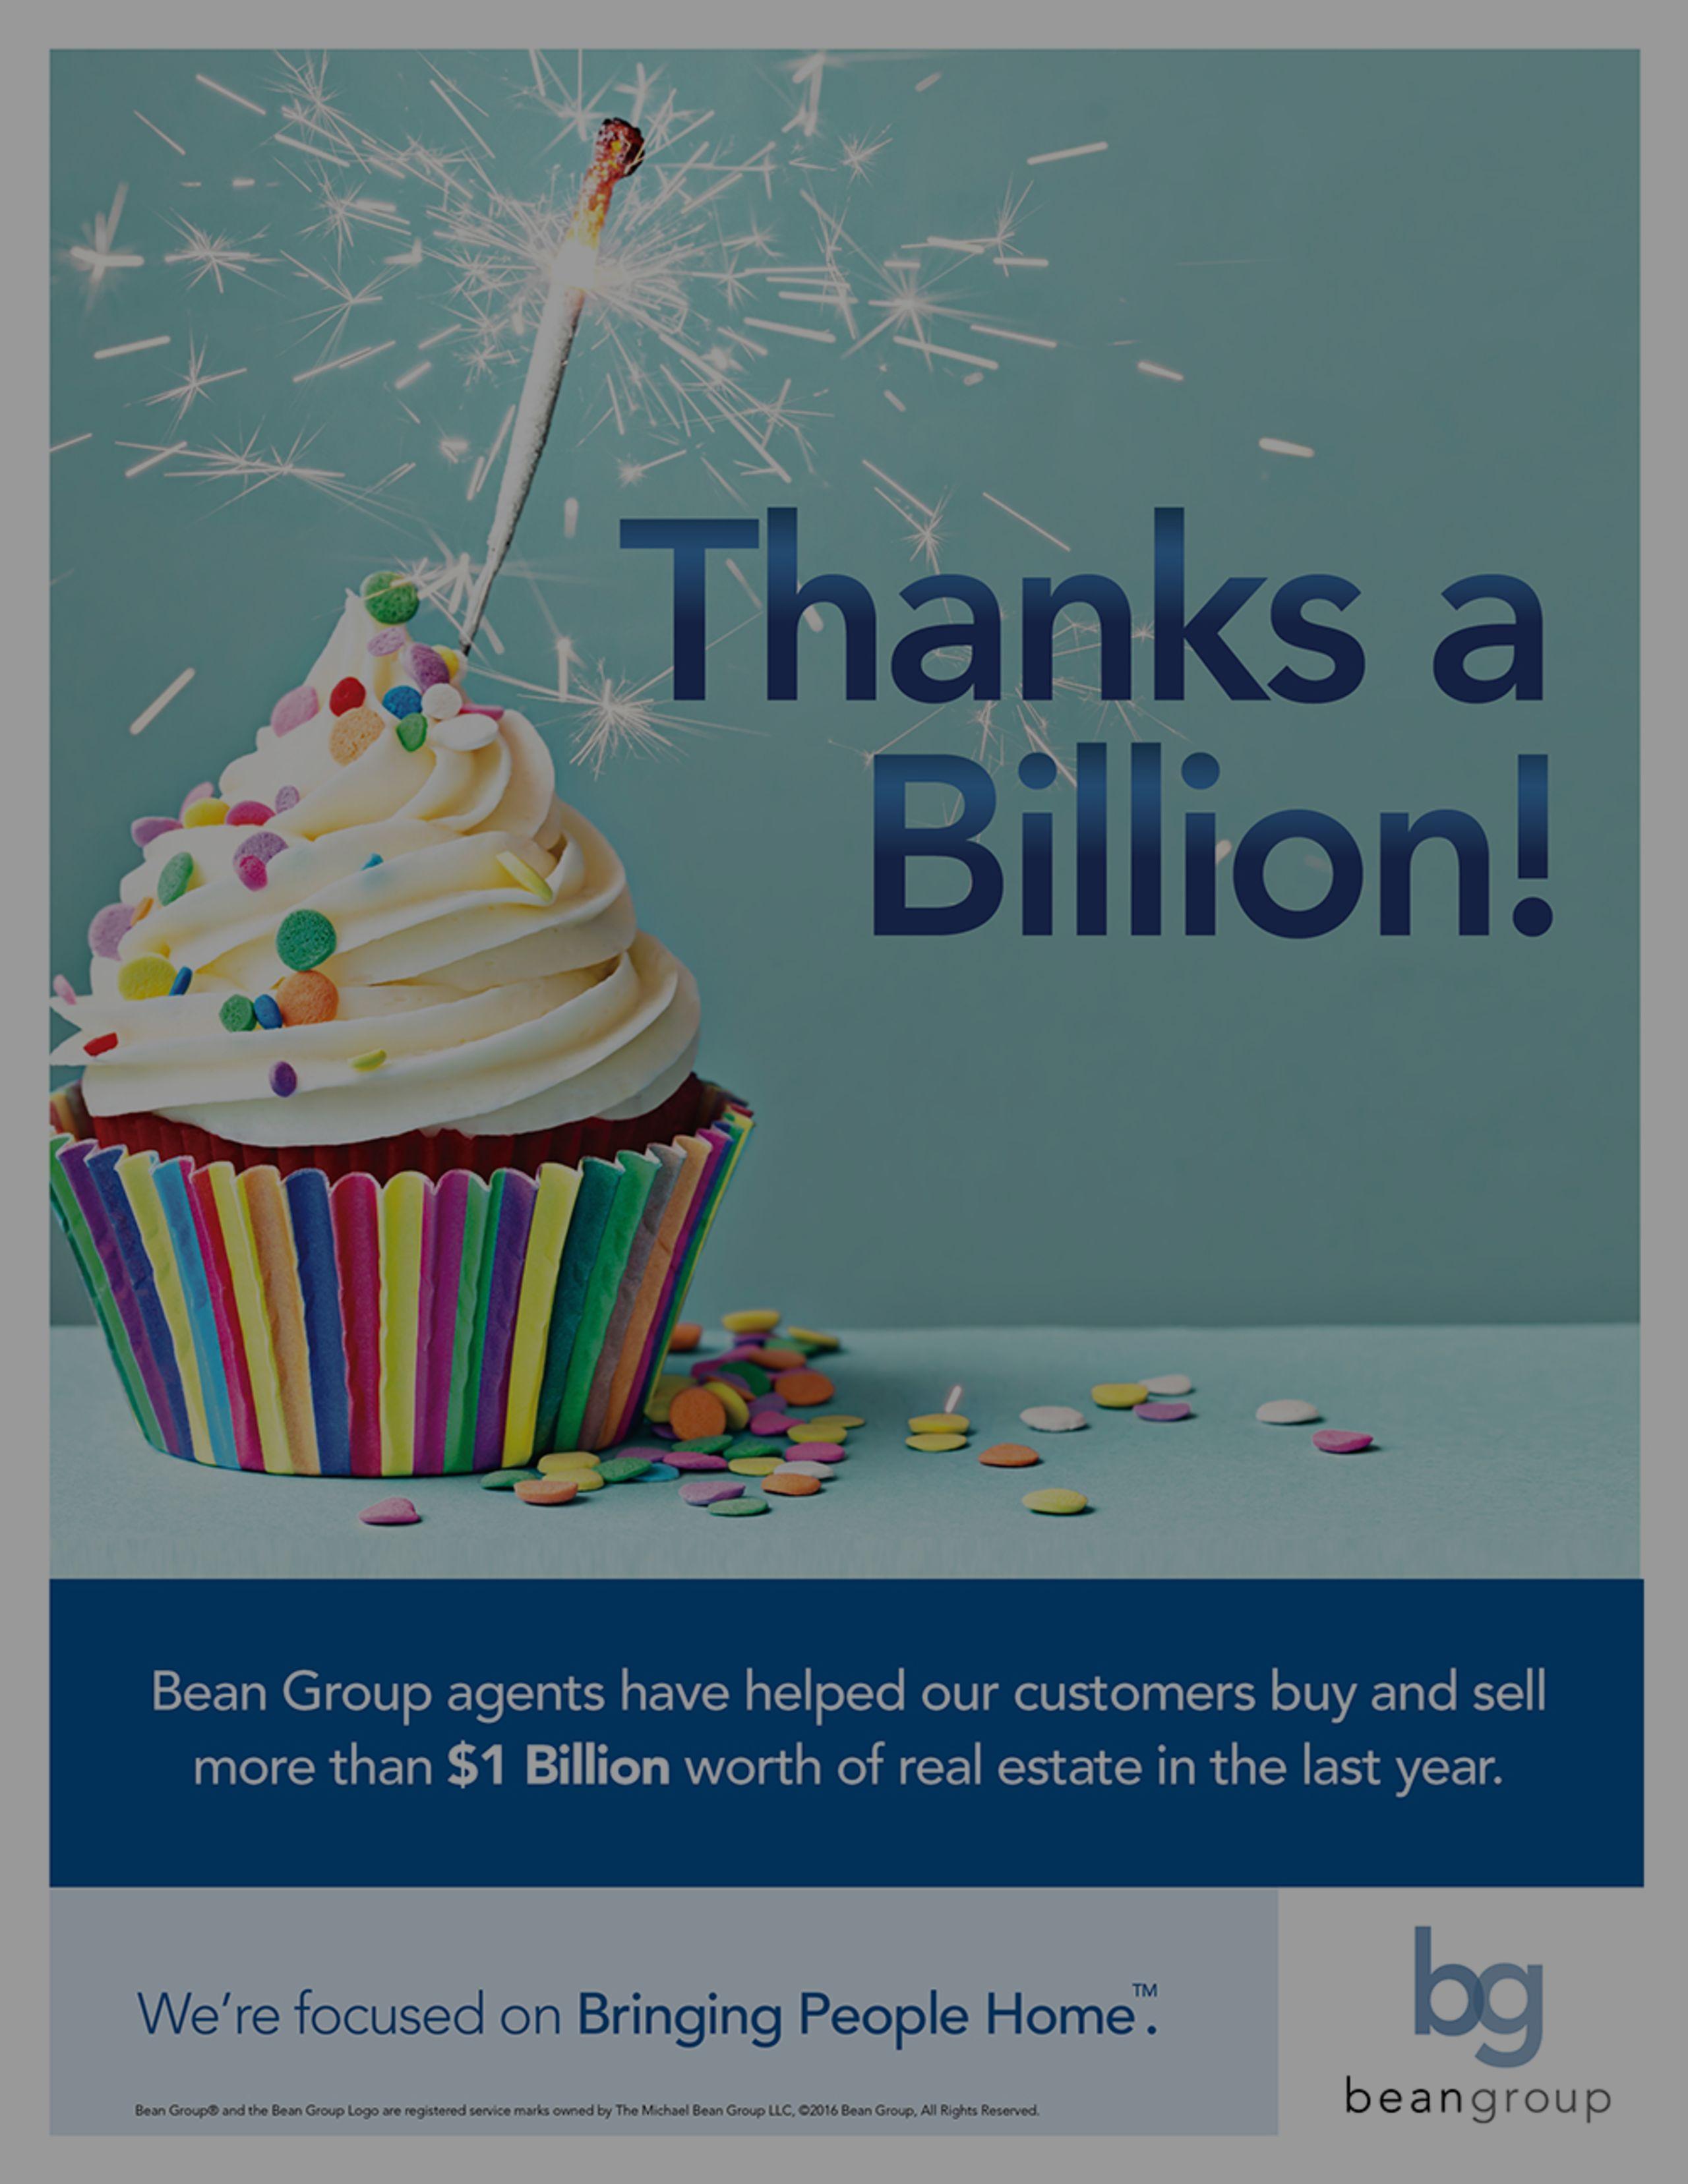 Thanks a Billion!